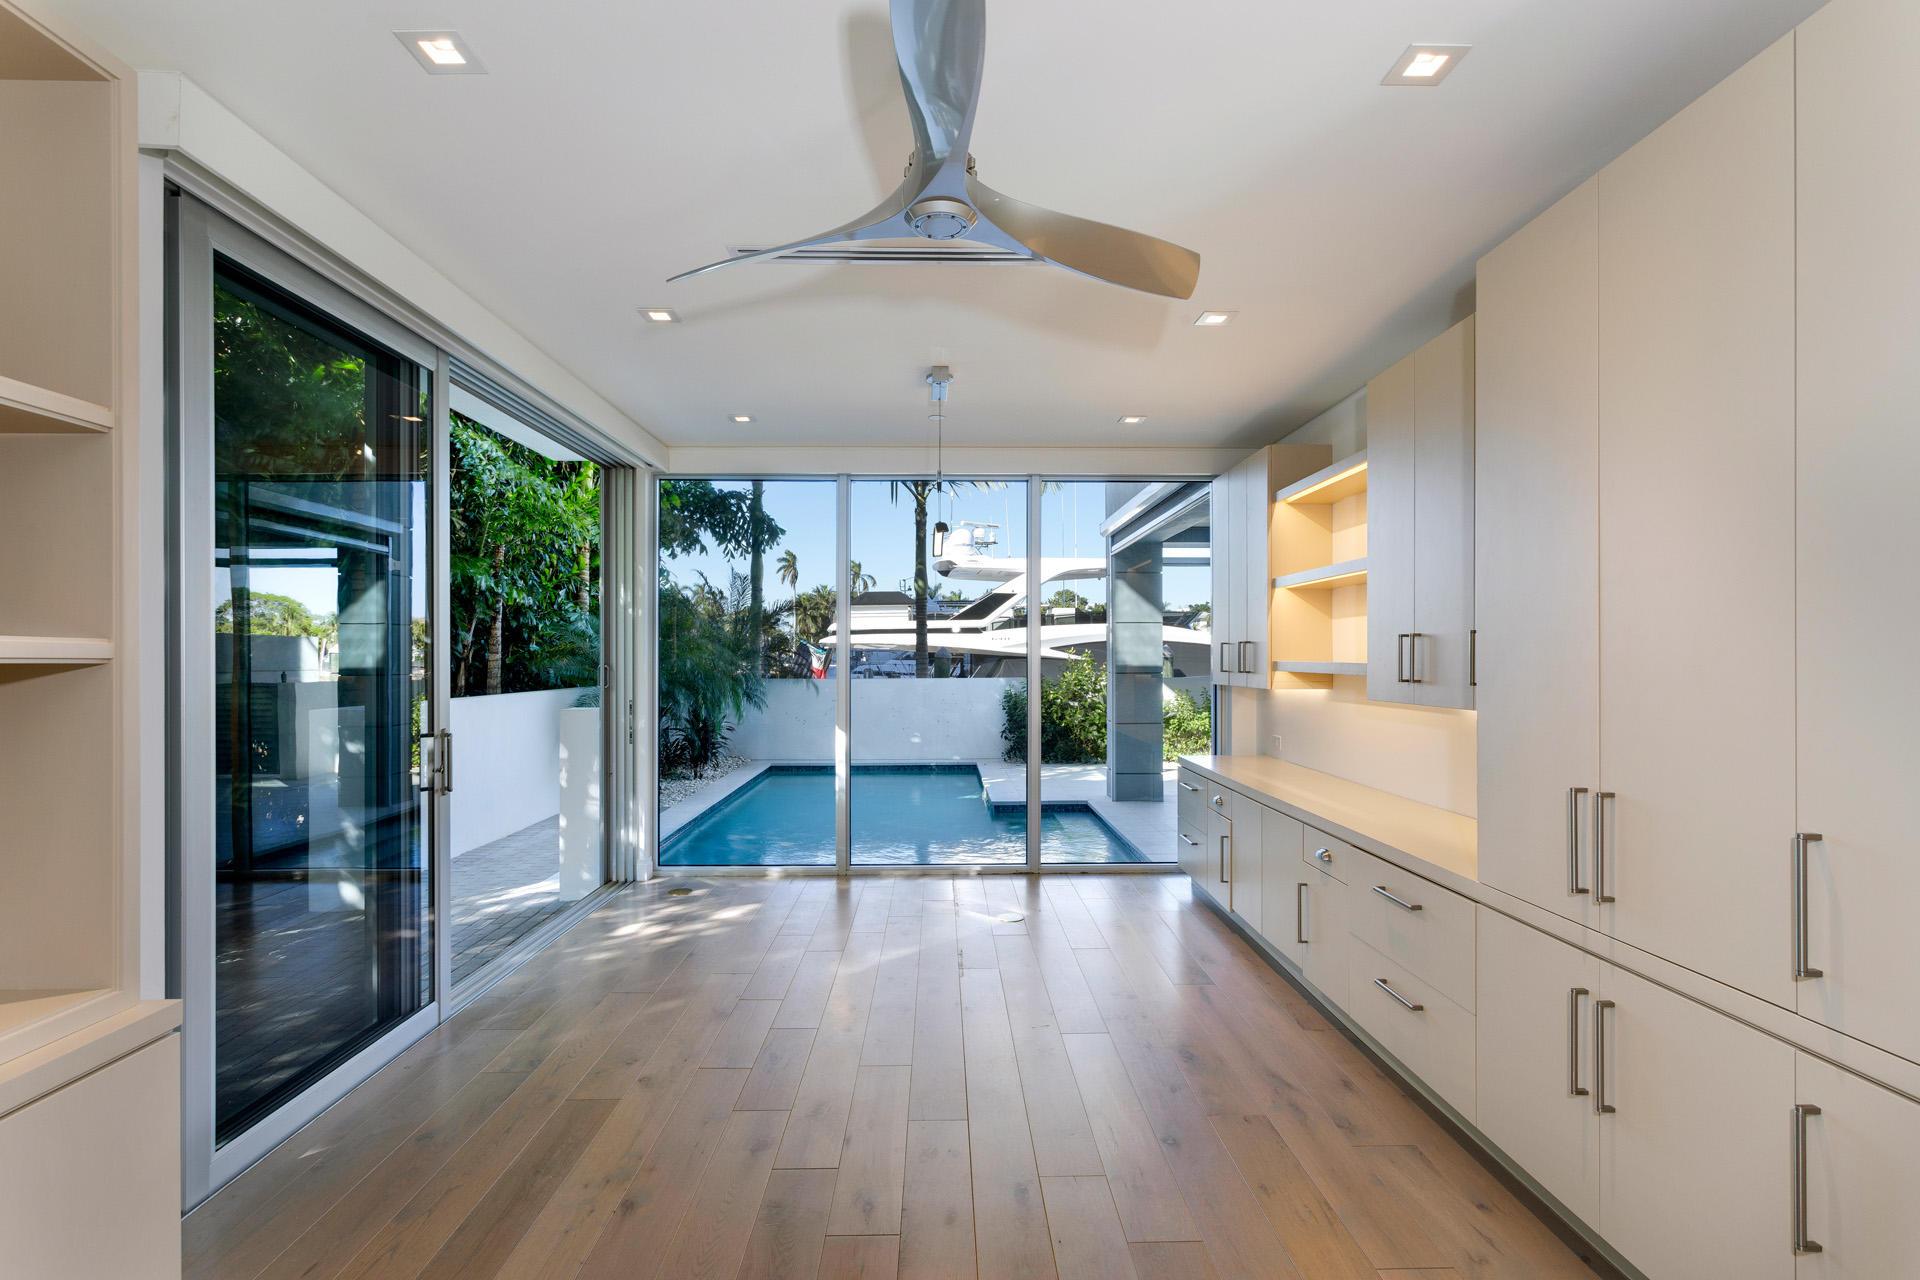 138 Macfarlane Drive, Delray Beach, Florida 33483, 4 Bedrooms Bedrooms, ,4.1 BathroomsBathrooms,Townhouse,For Sale,Macfarlane,RX-10509987